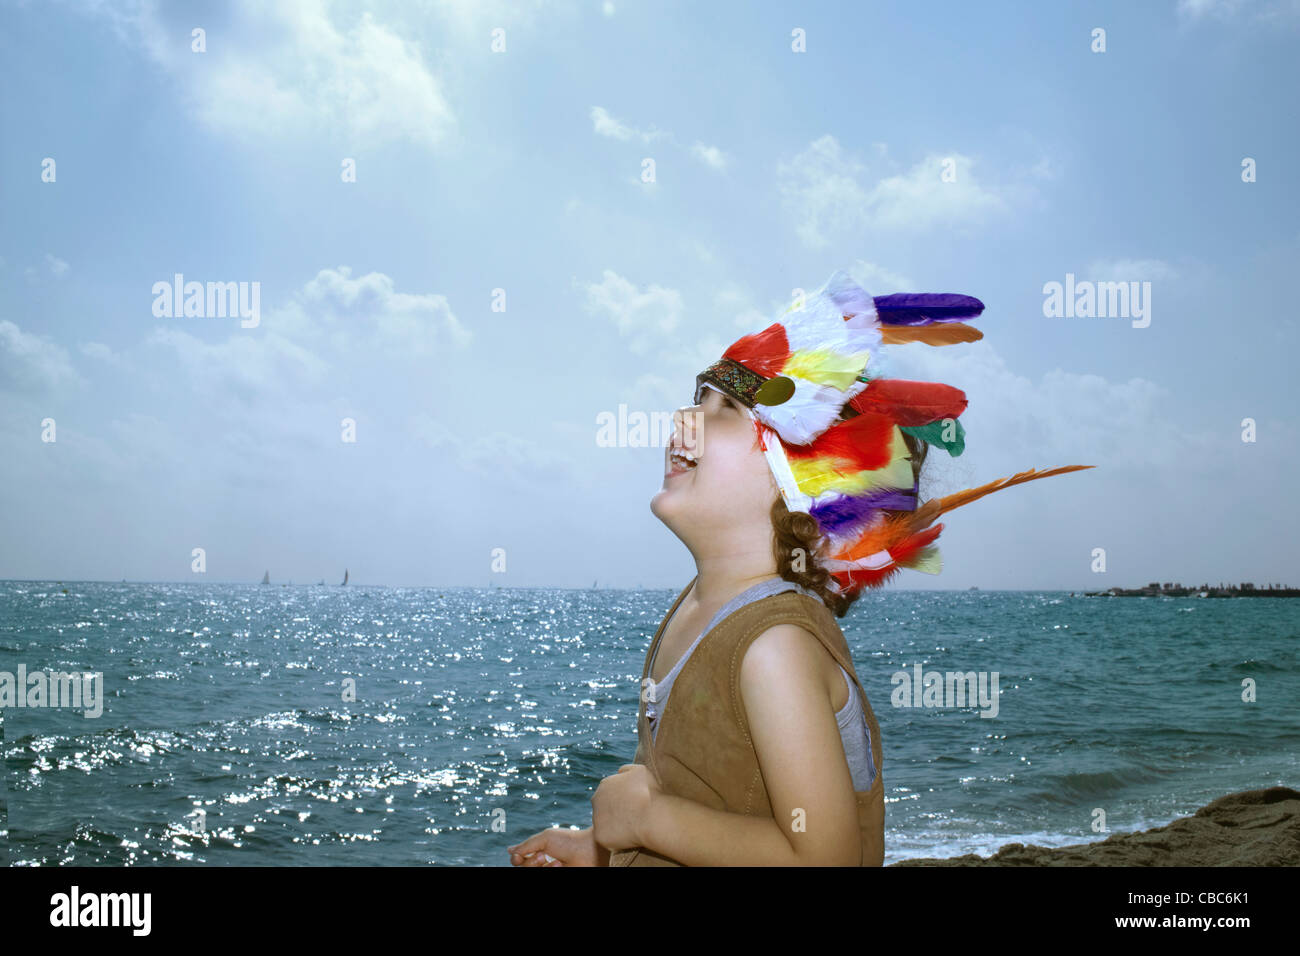 Toddler in Indian headdress on beach - Stock Image